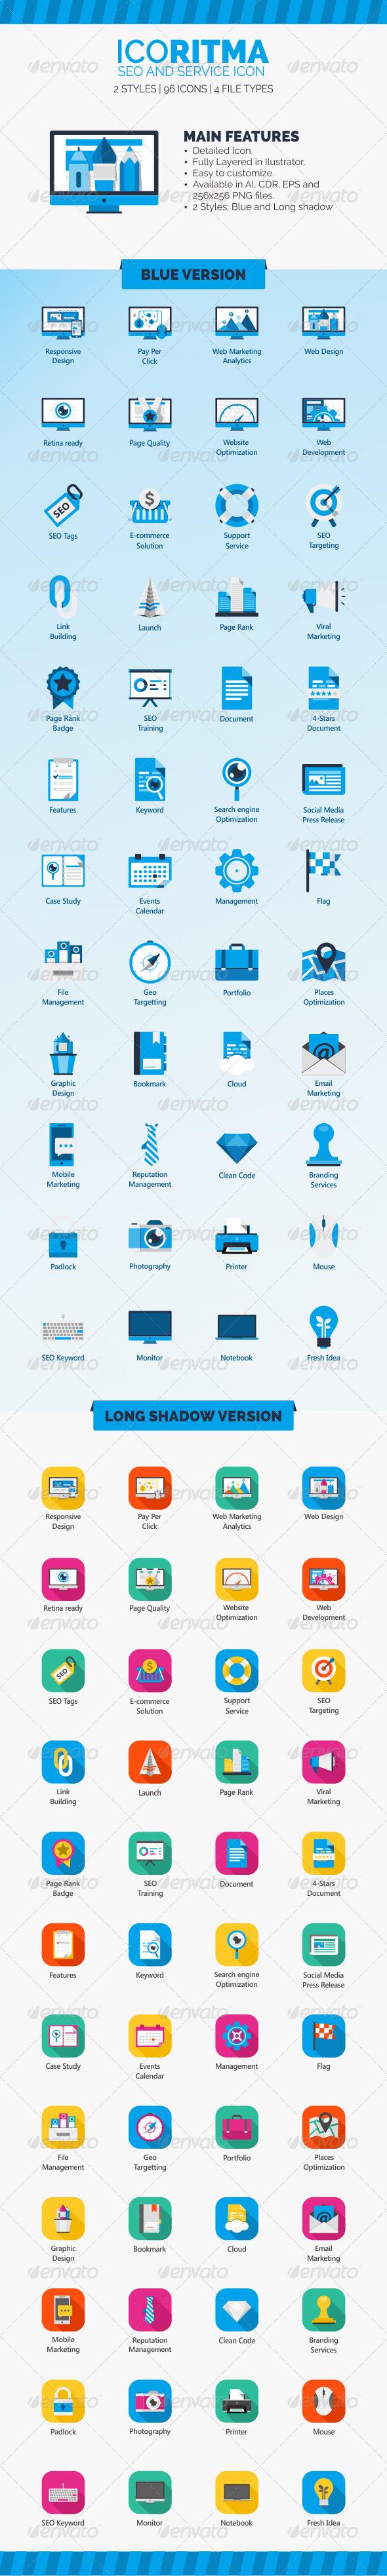 Icoritma Seo and Service Icons